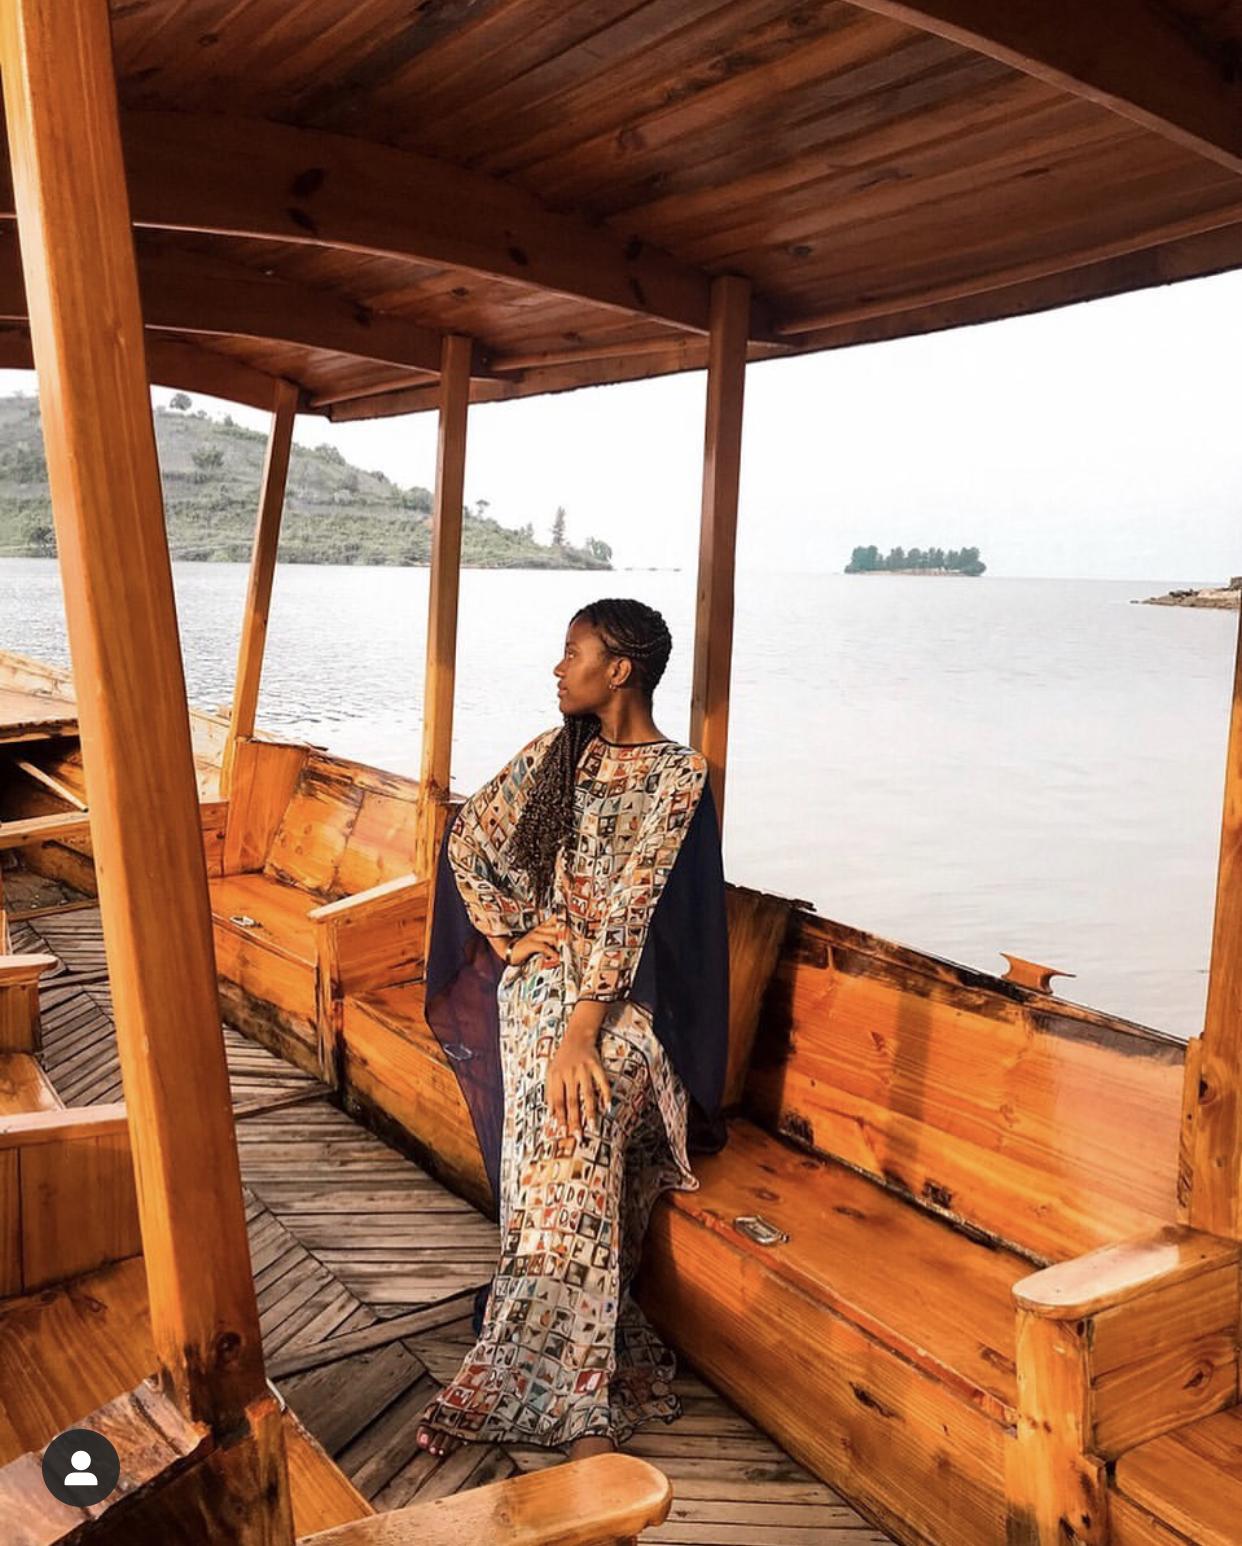 rwanda travel guide, lake kivu